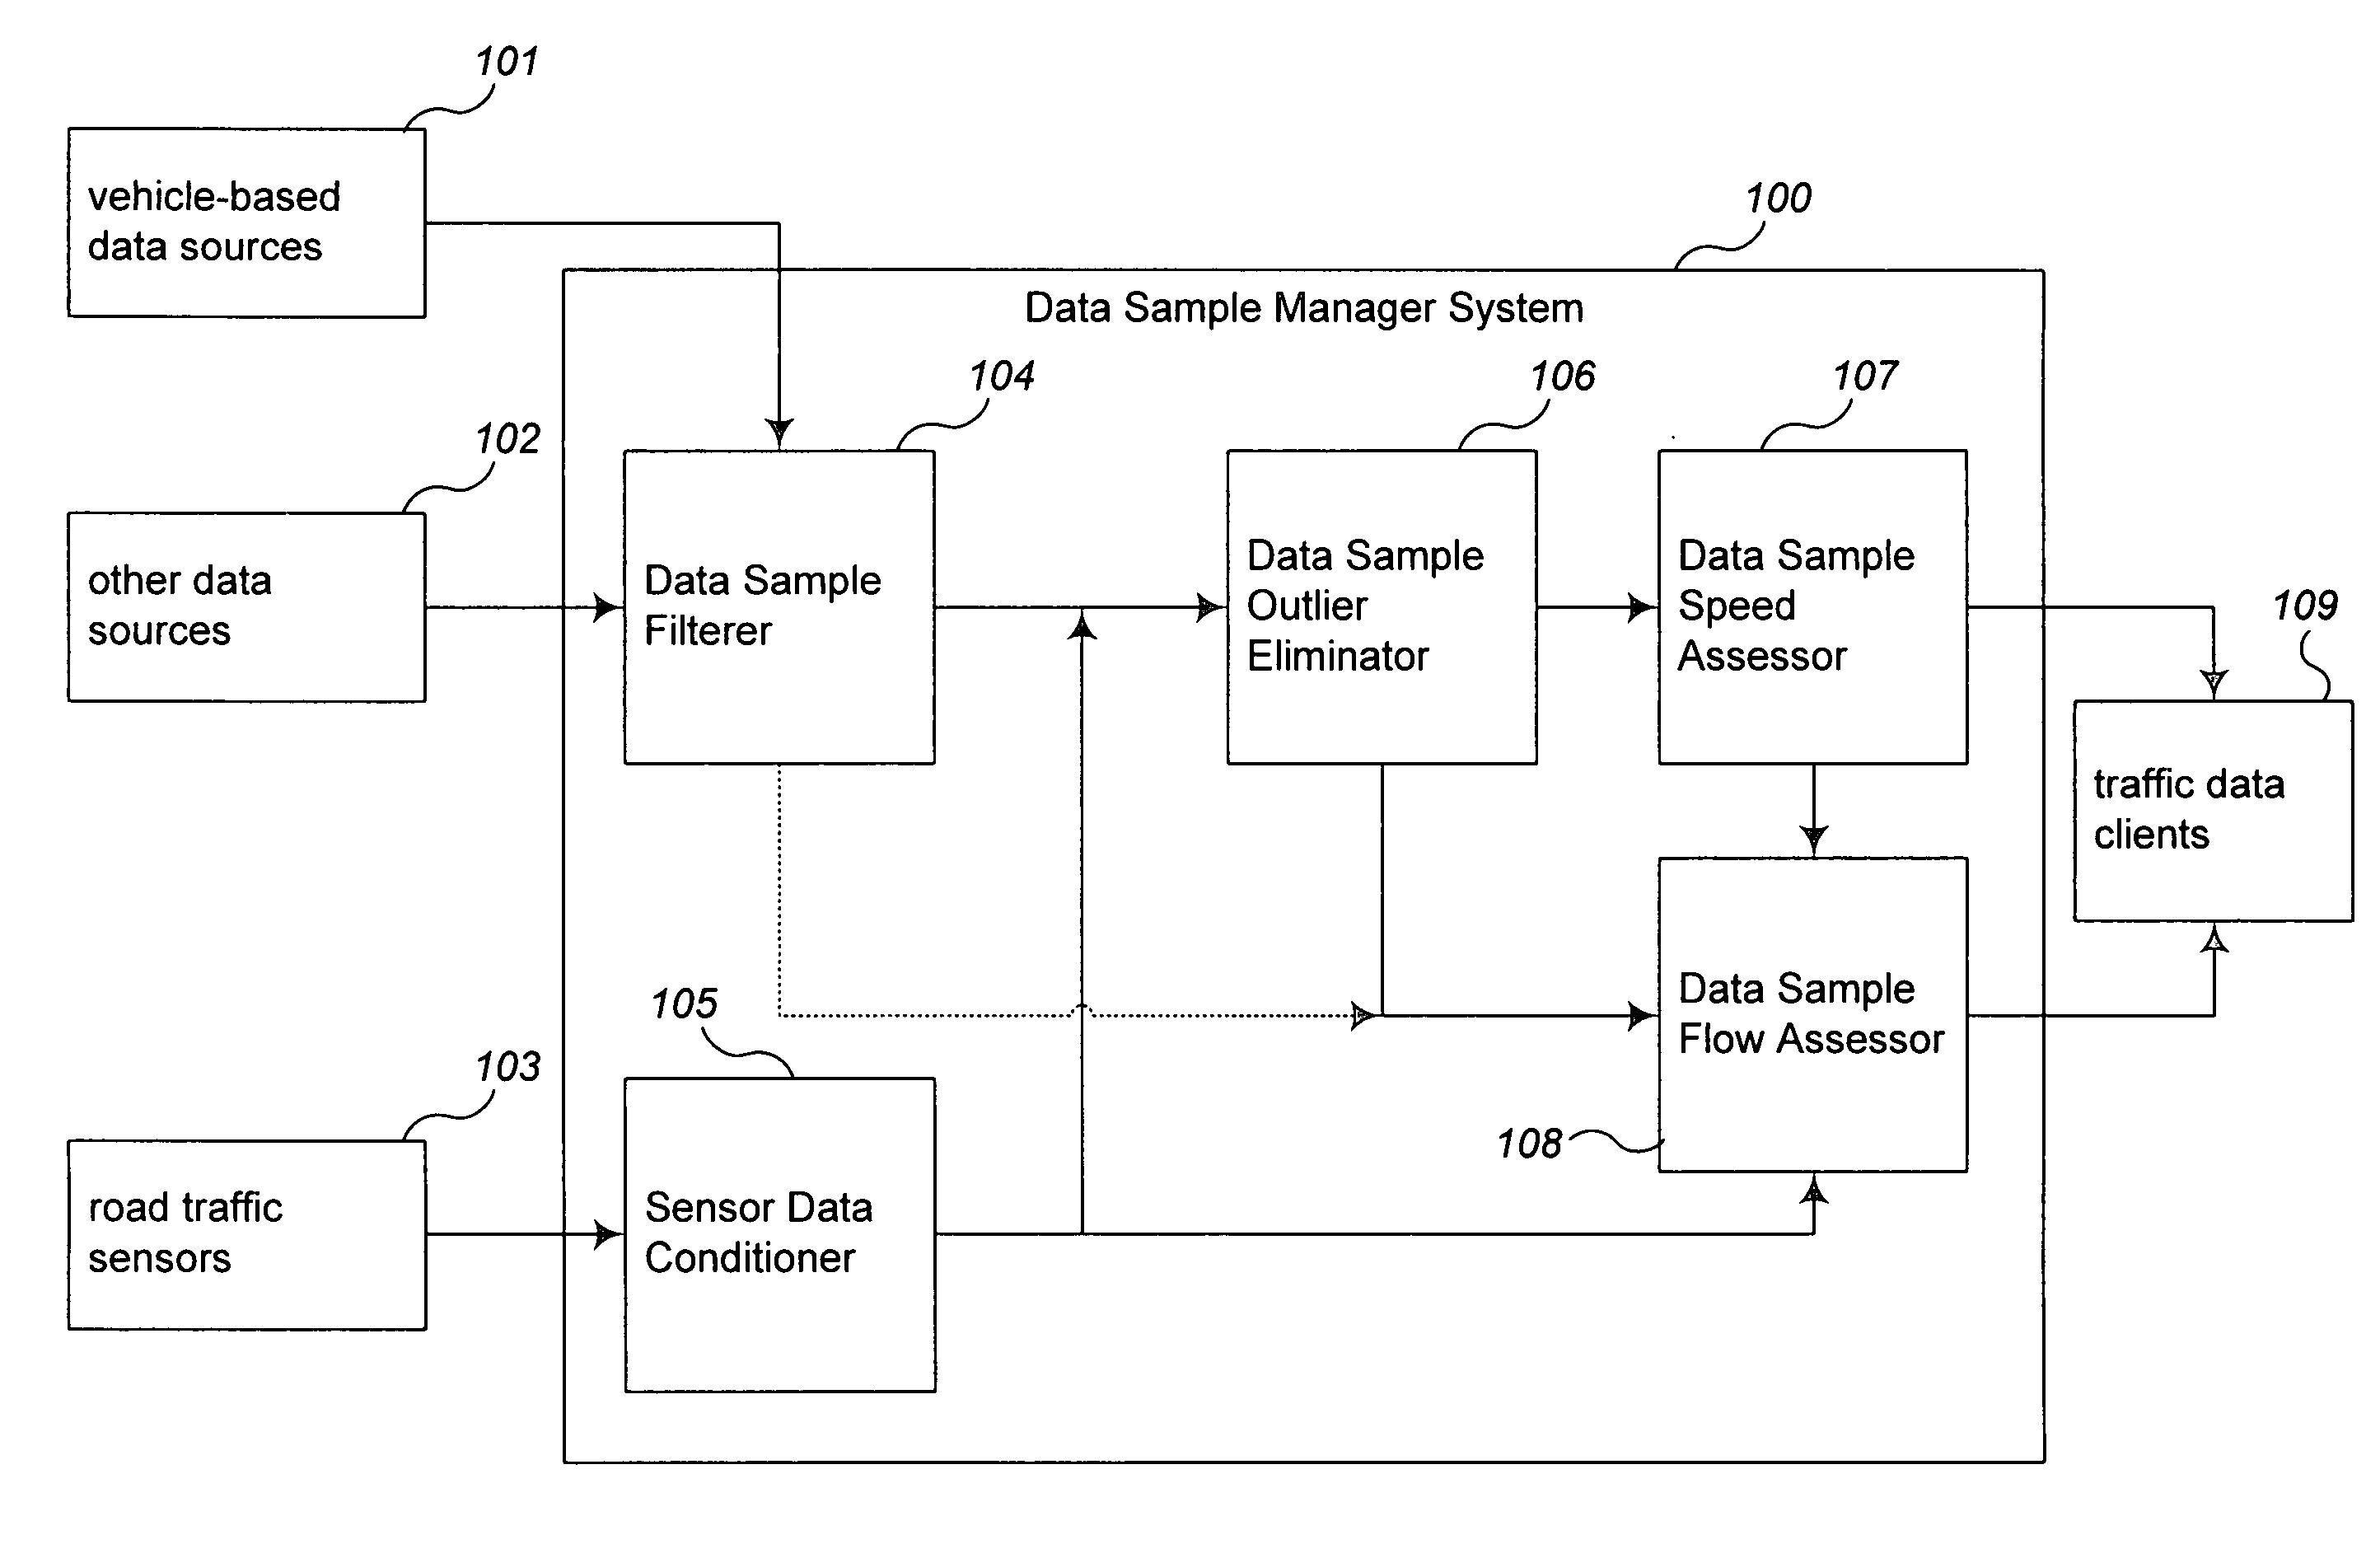 Triangle Squarewave Generator Circuit Diagram Tradeoficcom Wiring Sweep Patent Us20070208496 Obtaining Road Traffic Condition Data From